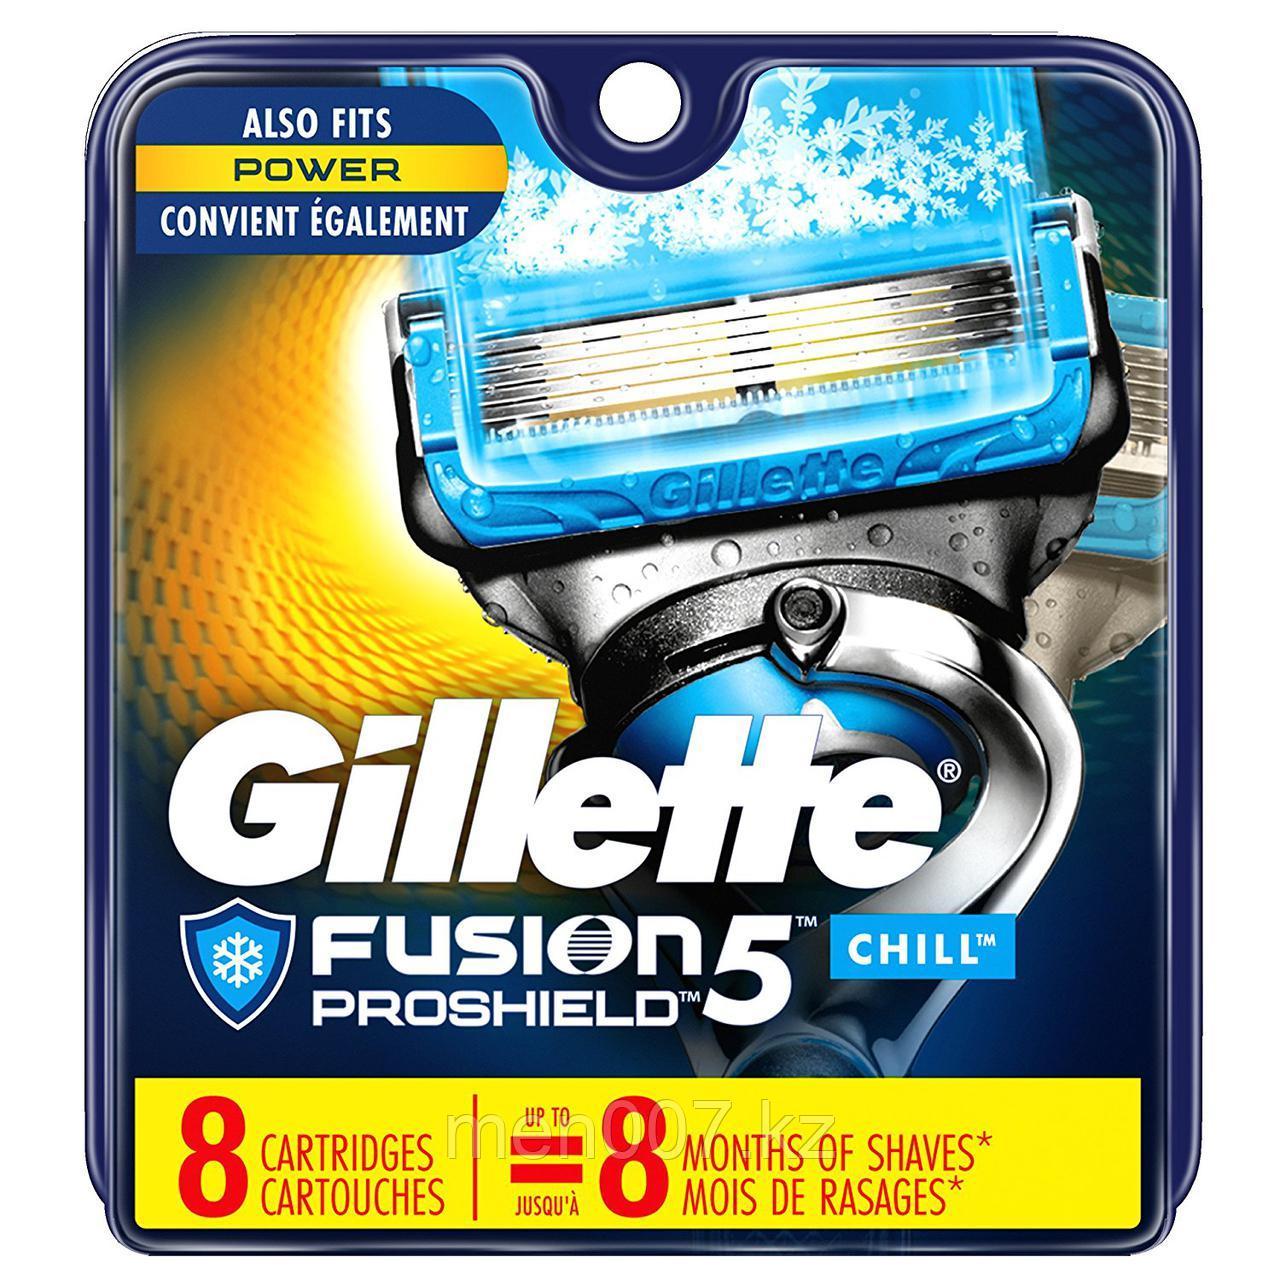 Gillette Fusion 5 PROSHIELD (8 кассет) США